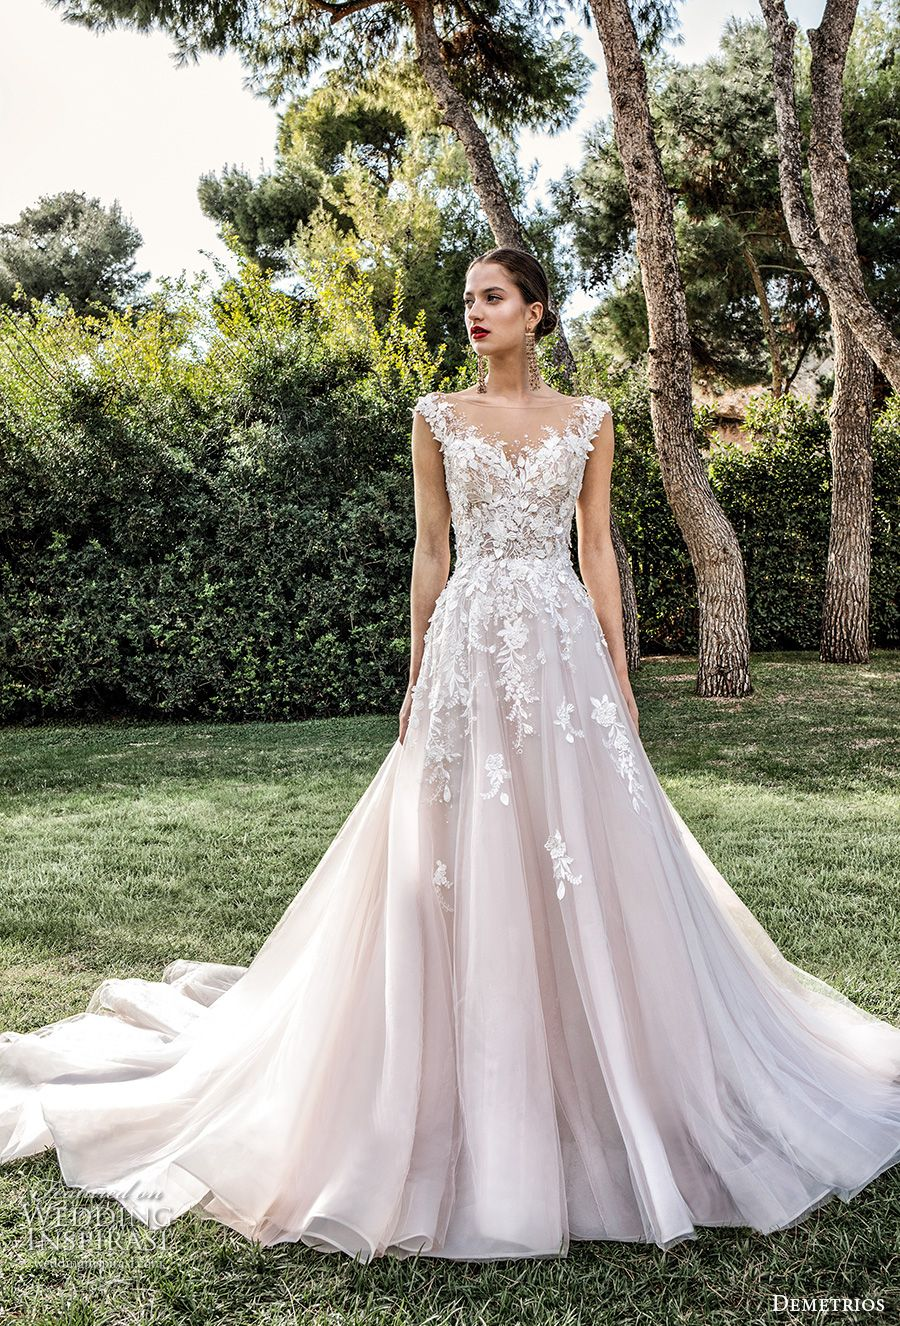 Demetrios Capsule 2020 Wedding Dresses Sophistique Bridal Collection Wedding Inspirasi Wedding Dress Necklines Wedding Night Dress Wedding Dress Styles